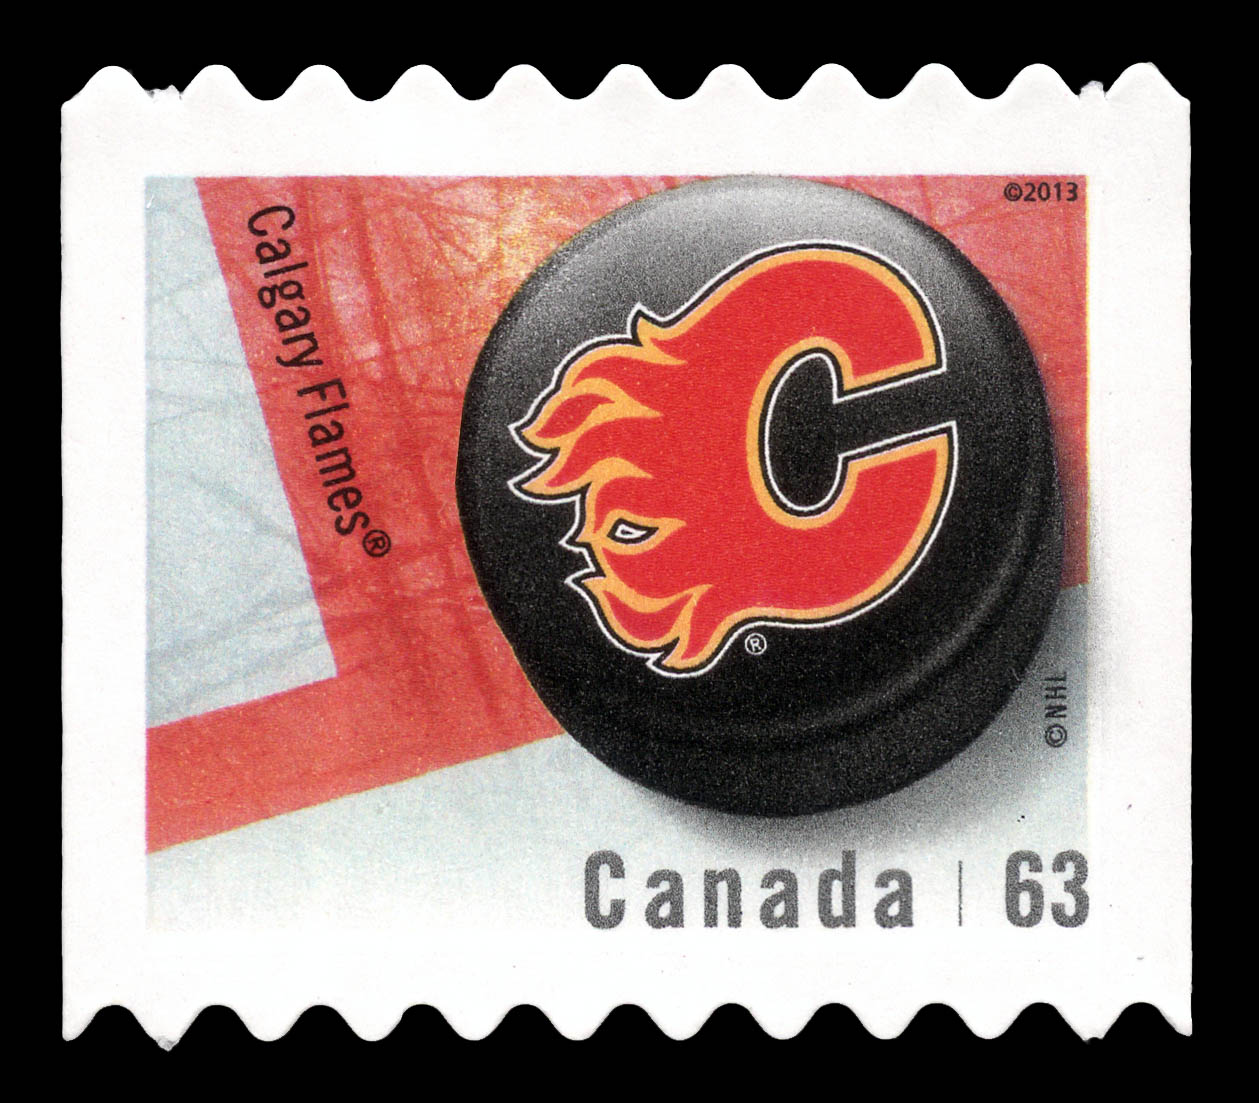 Calgary Flames Canada Postage Stamp | NHL Canadian Team Pucks